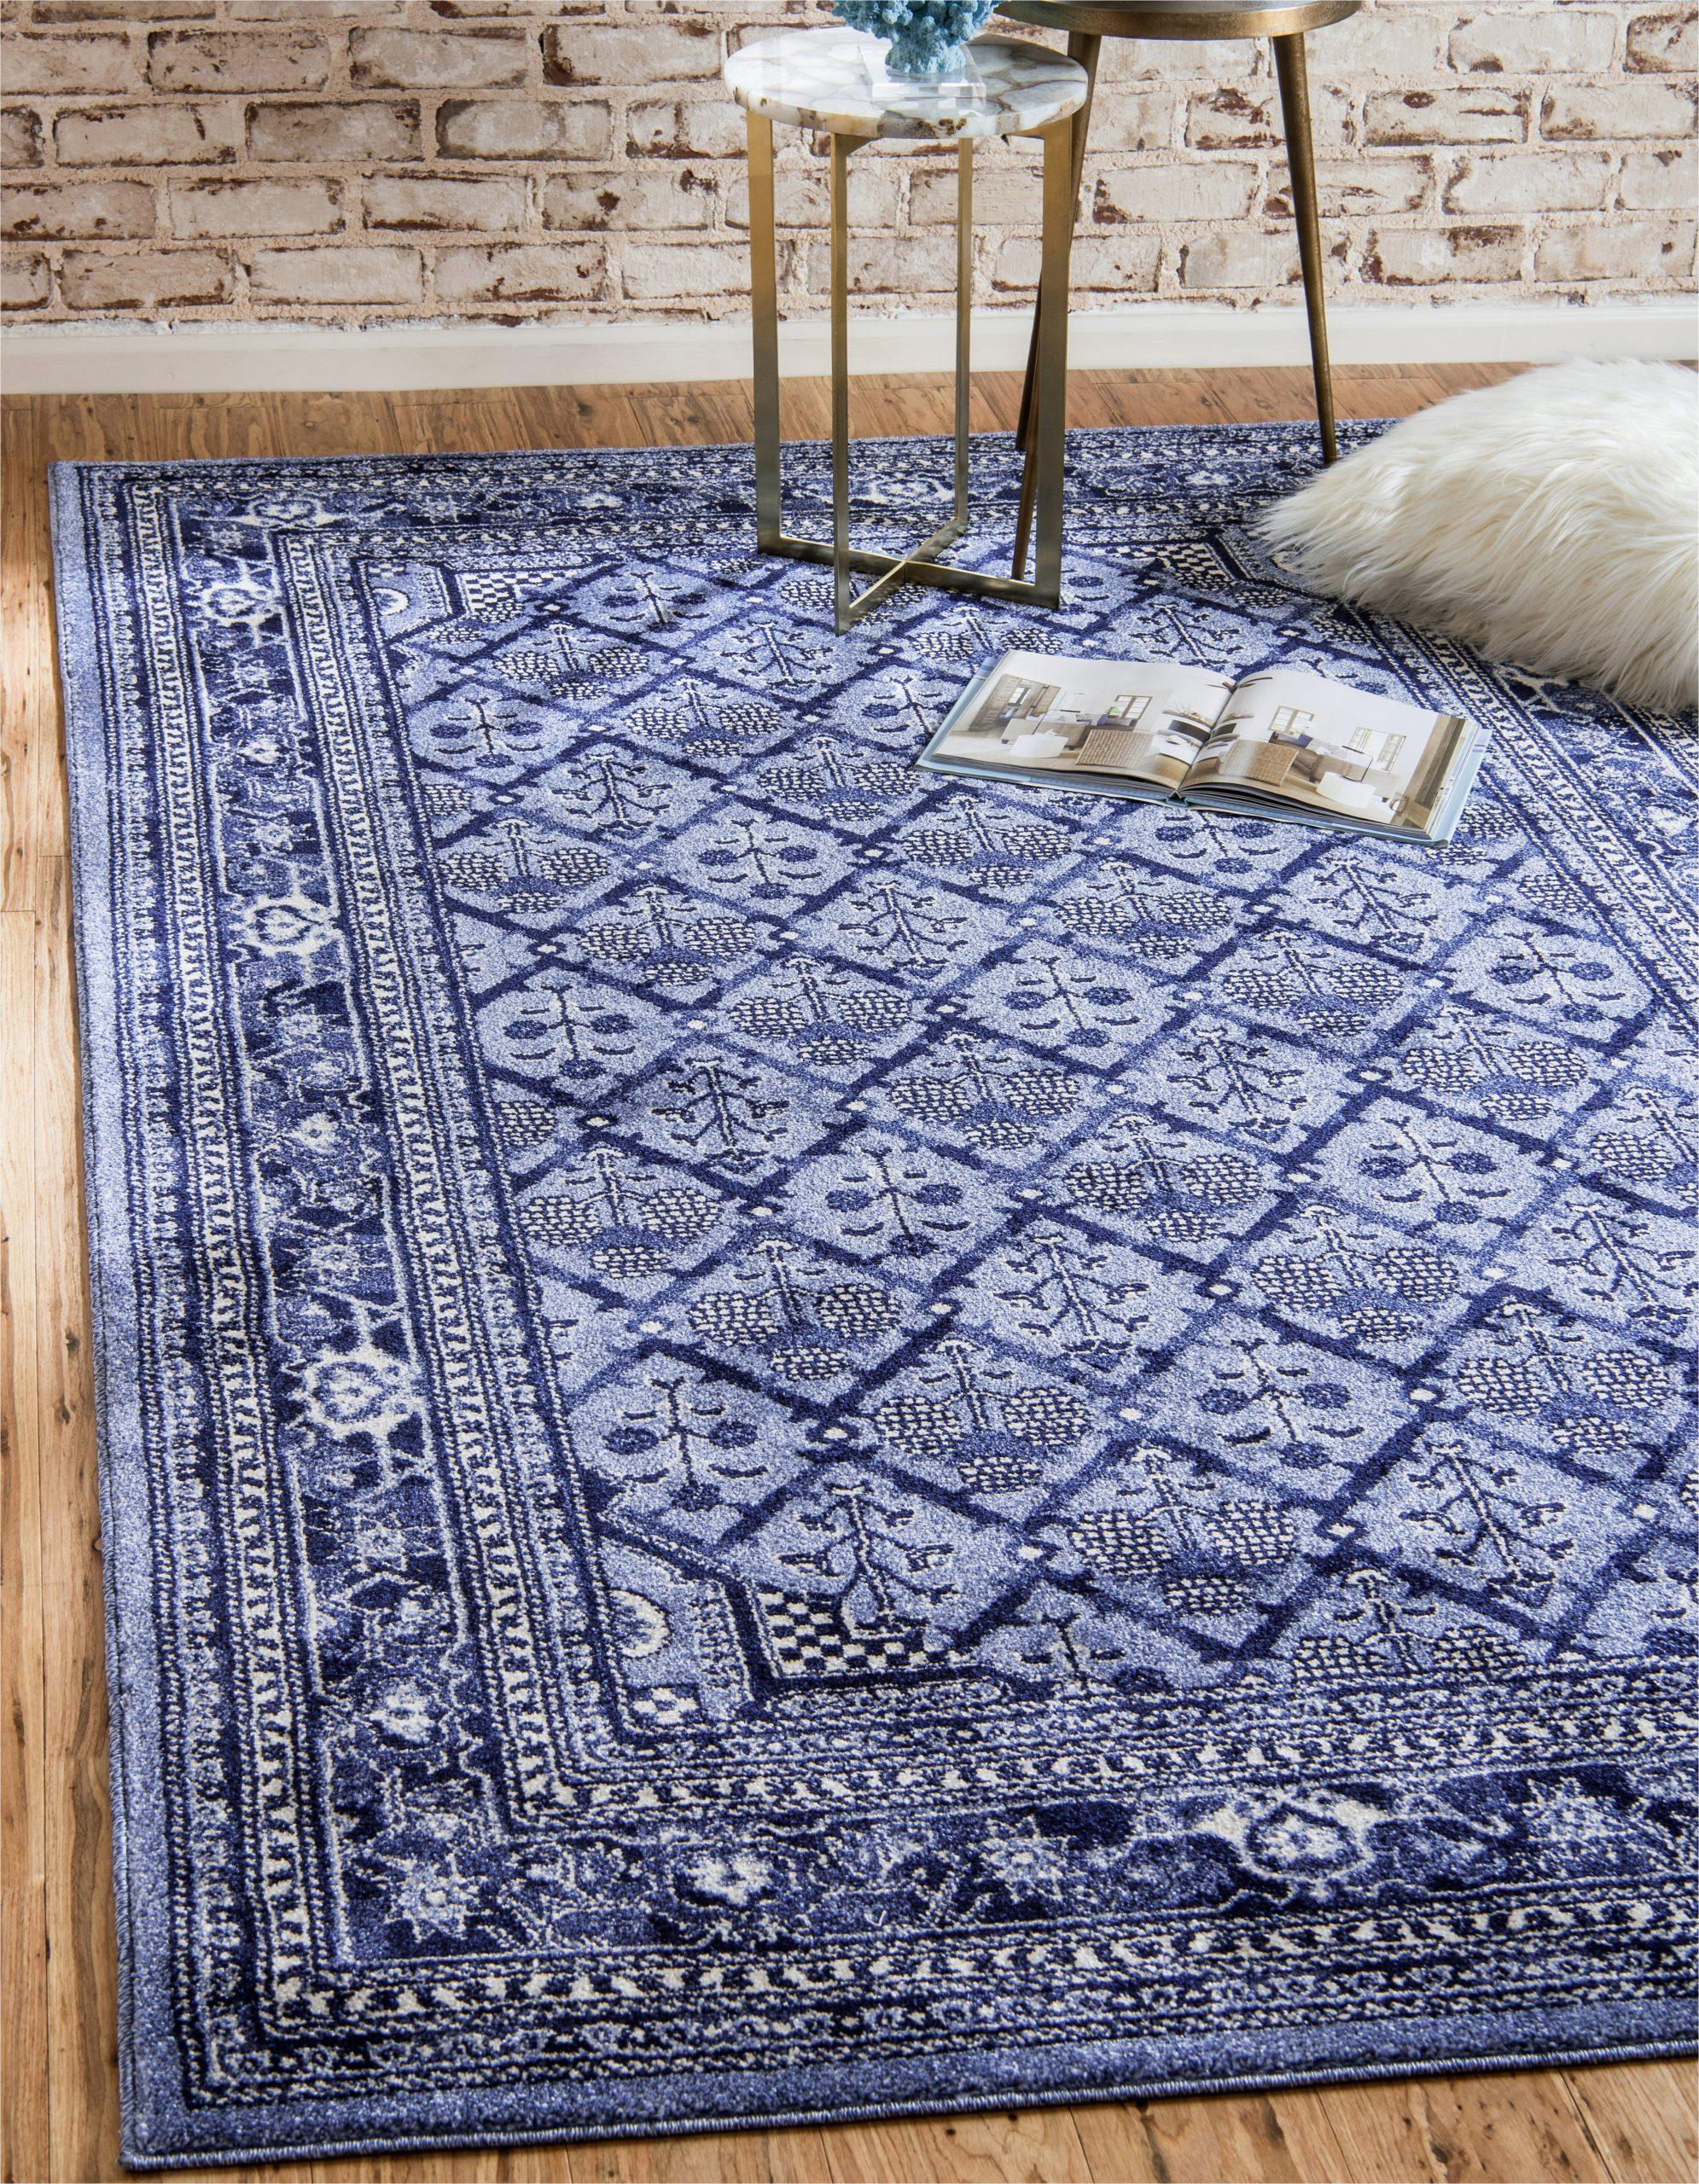 katiranoma blue area rug l167 k wdmg6117